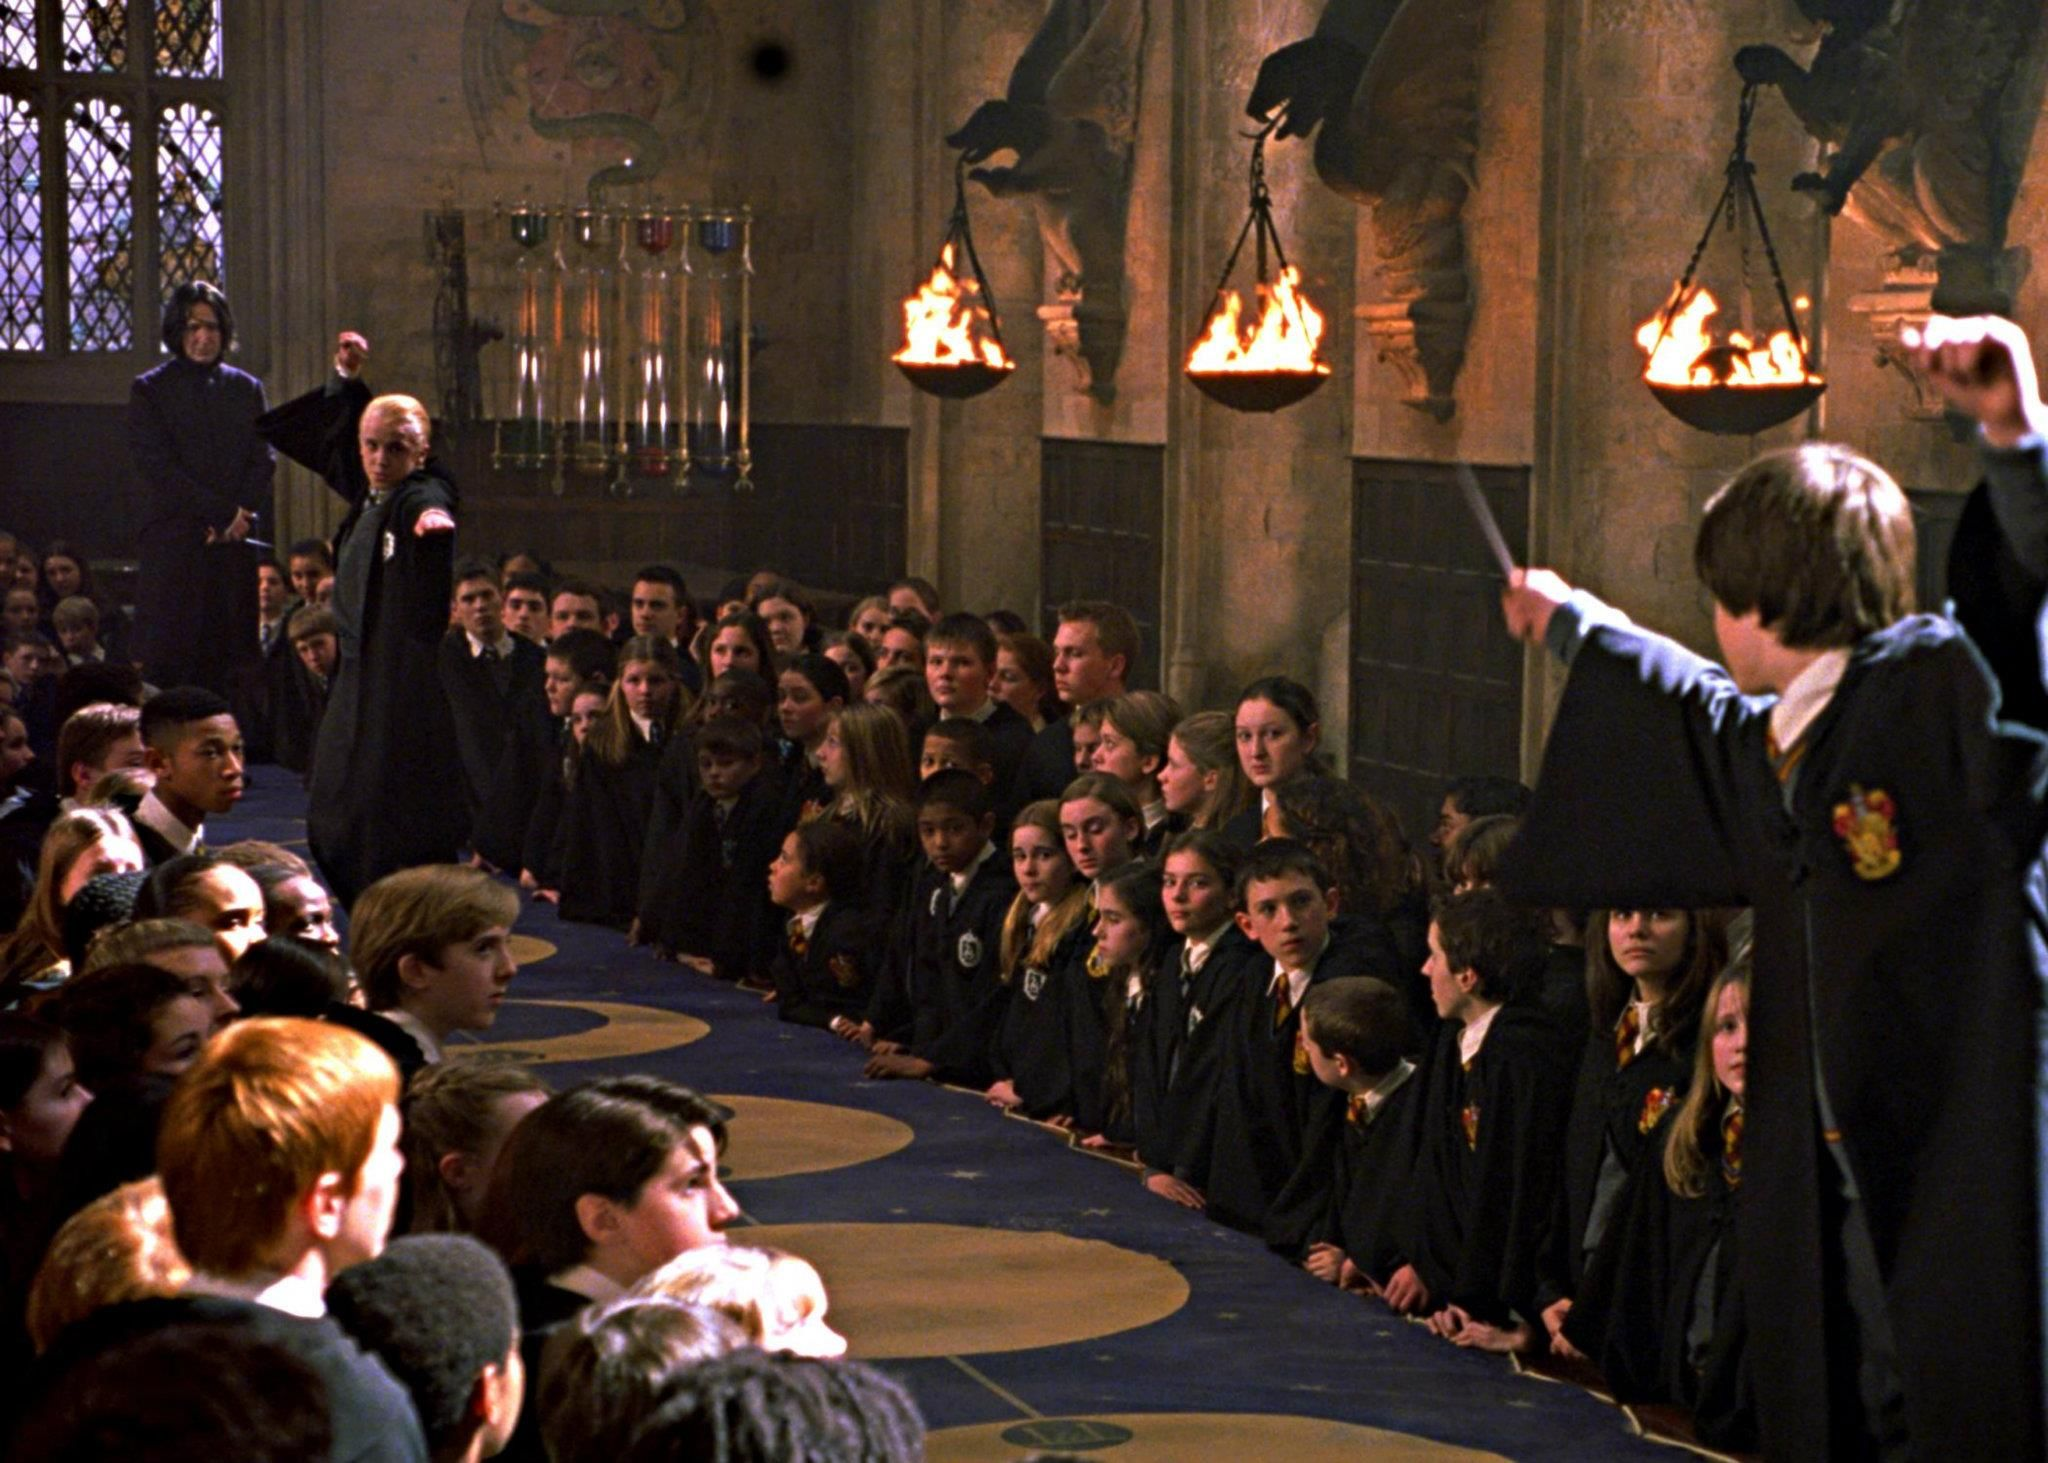 Draco & Harry duel #harrypotter | Harry potter pictures, Harry potter  movies, Harry potter wiki